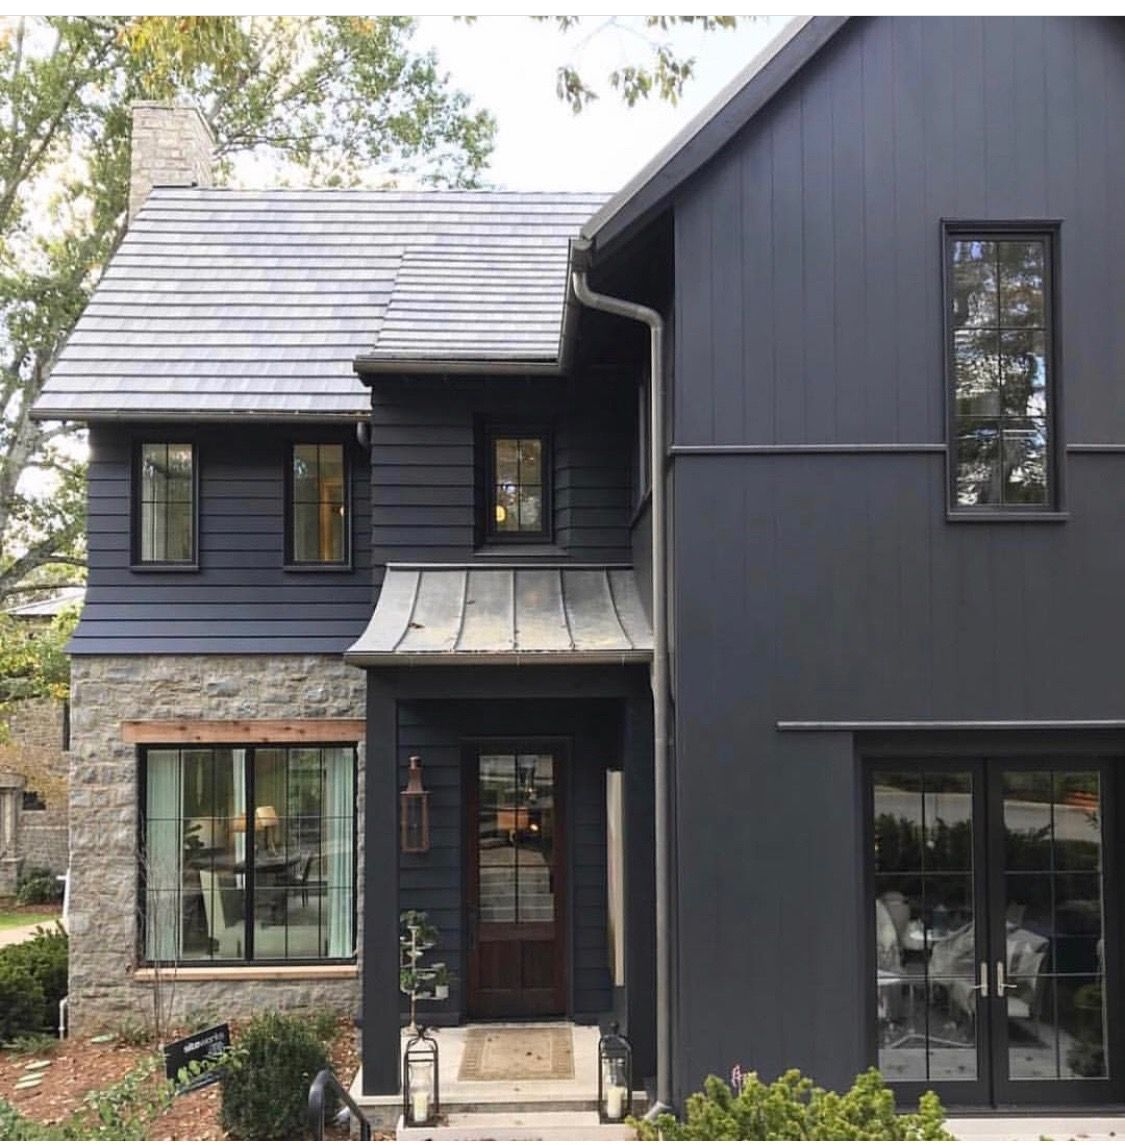 Grey Siding With Black Trim With Black Trim Windows Modern